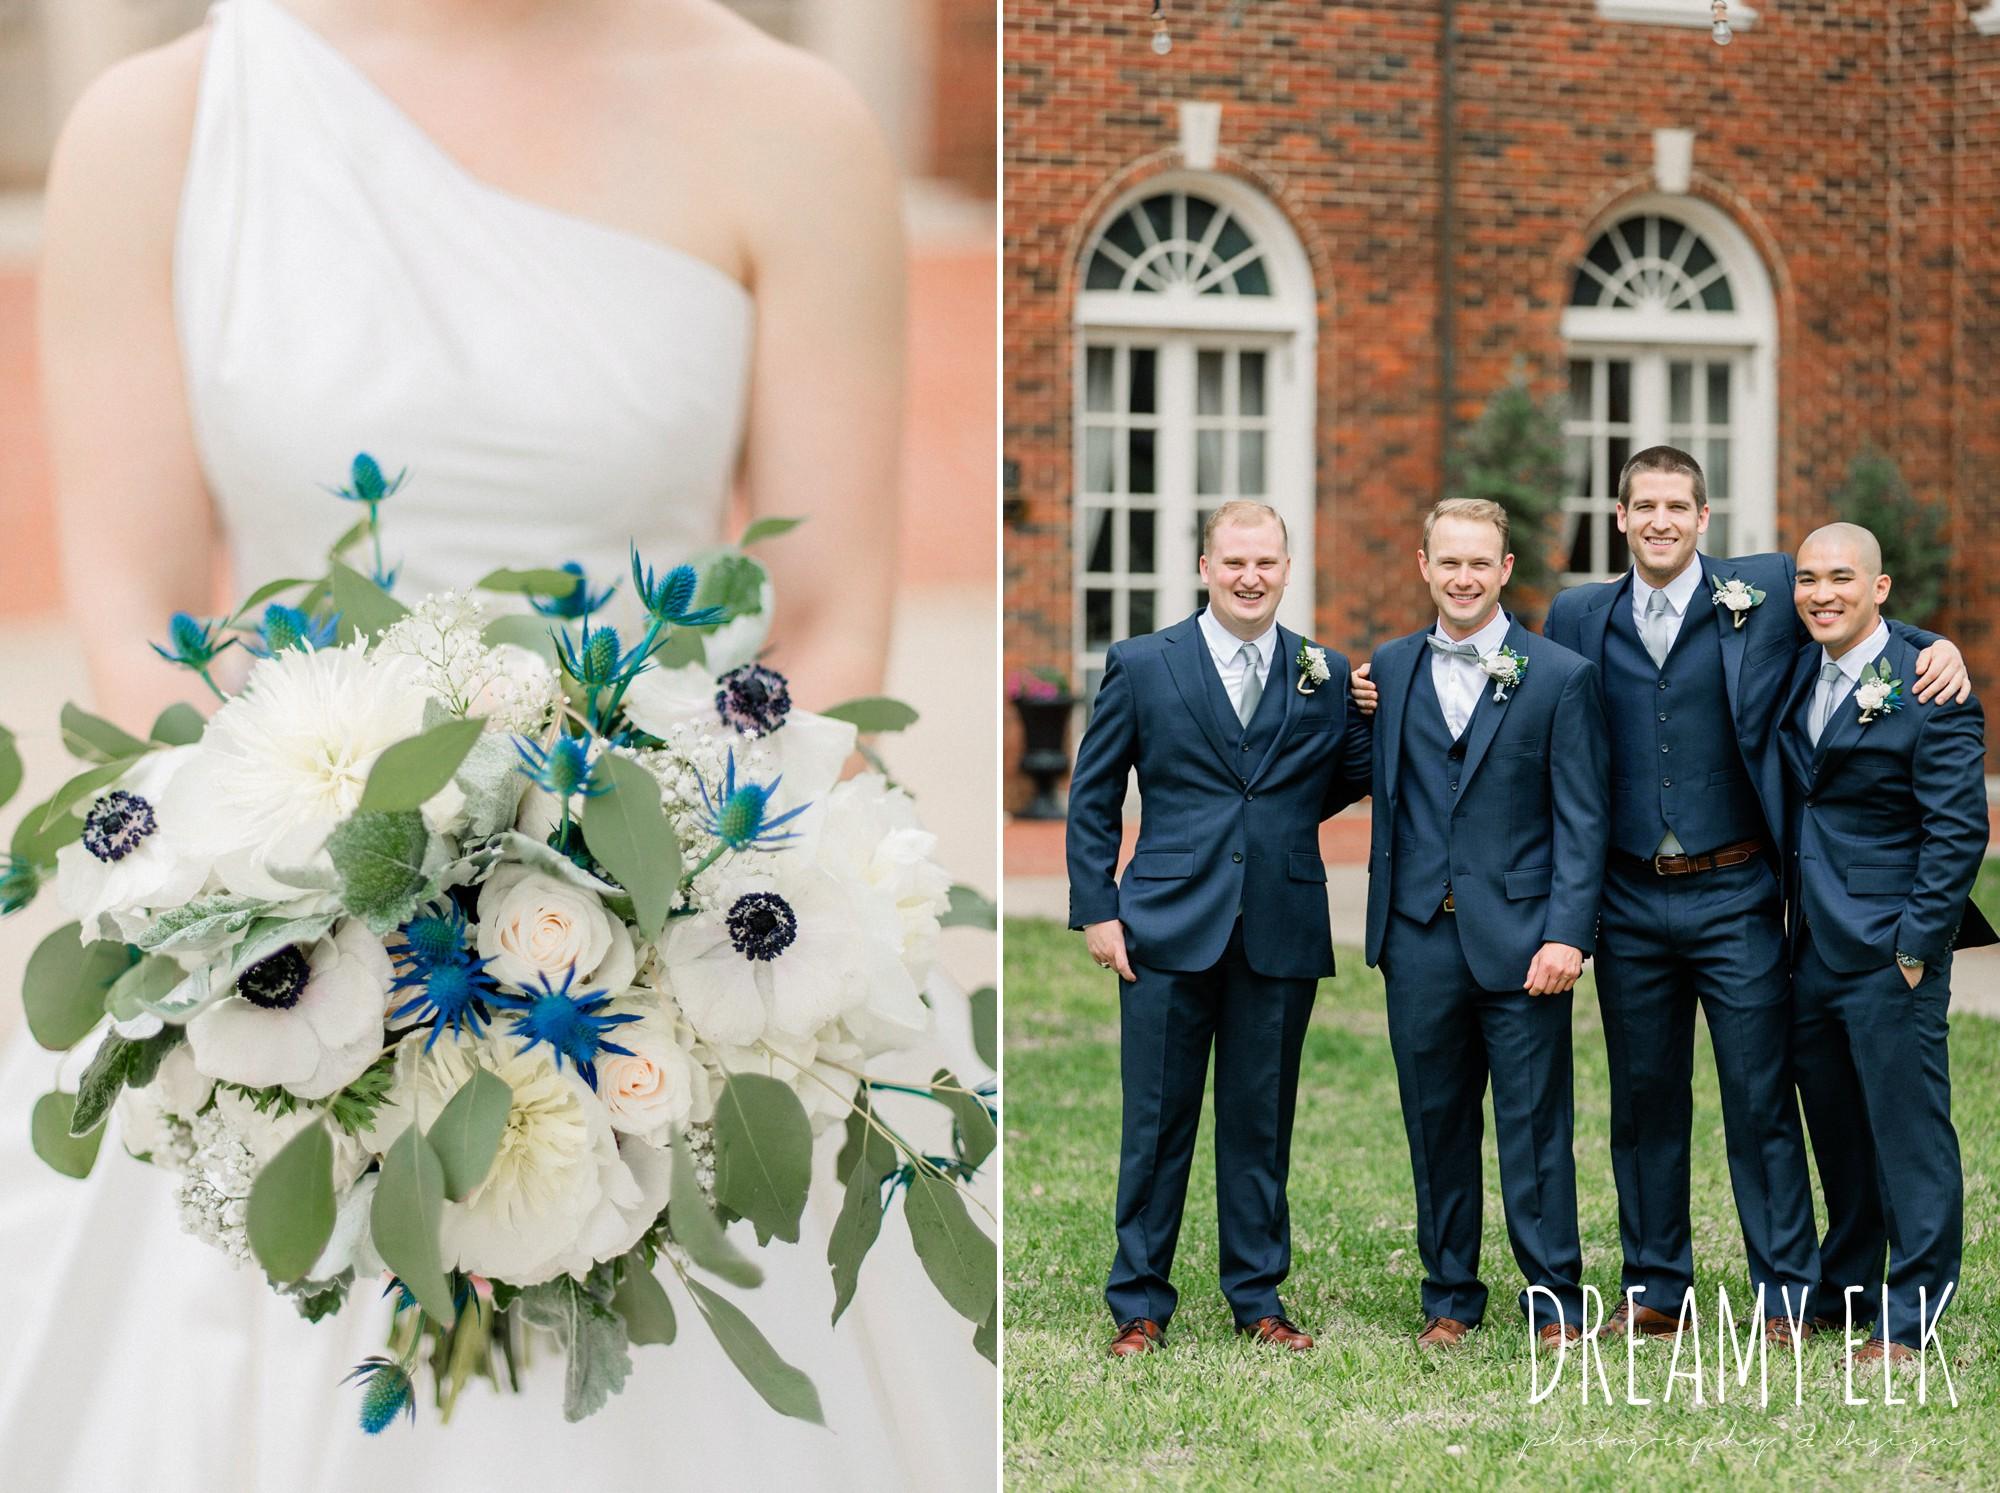 groom and groomsmen, blue wedding bouquet, modern wedding dress ballgown, spring wedding, the astin mansion, bryan, texas, spring wedding, dreamy elk photography and design